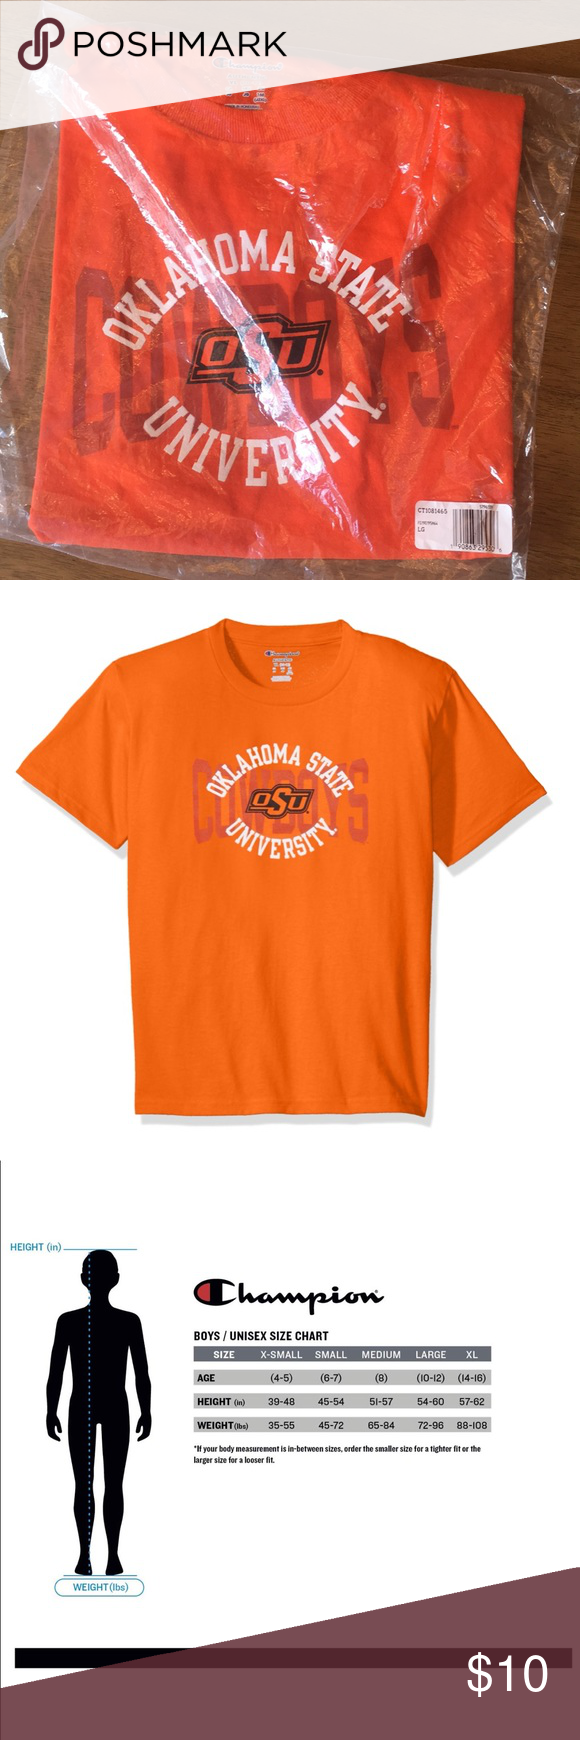 Champion Boys NCAA Youth Shirt 100/% Cotton Tagless Tee